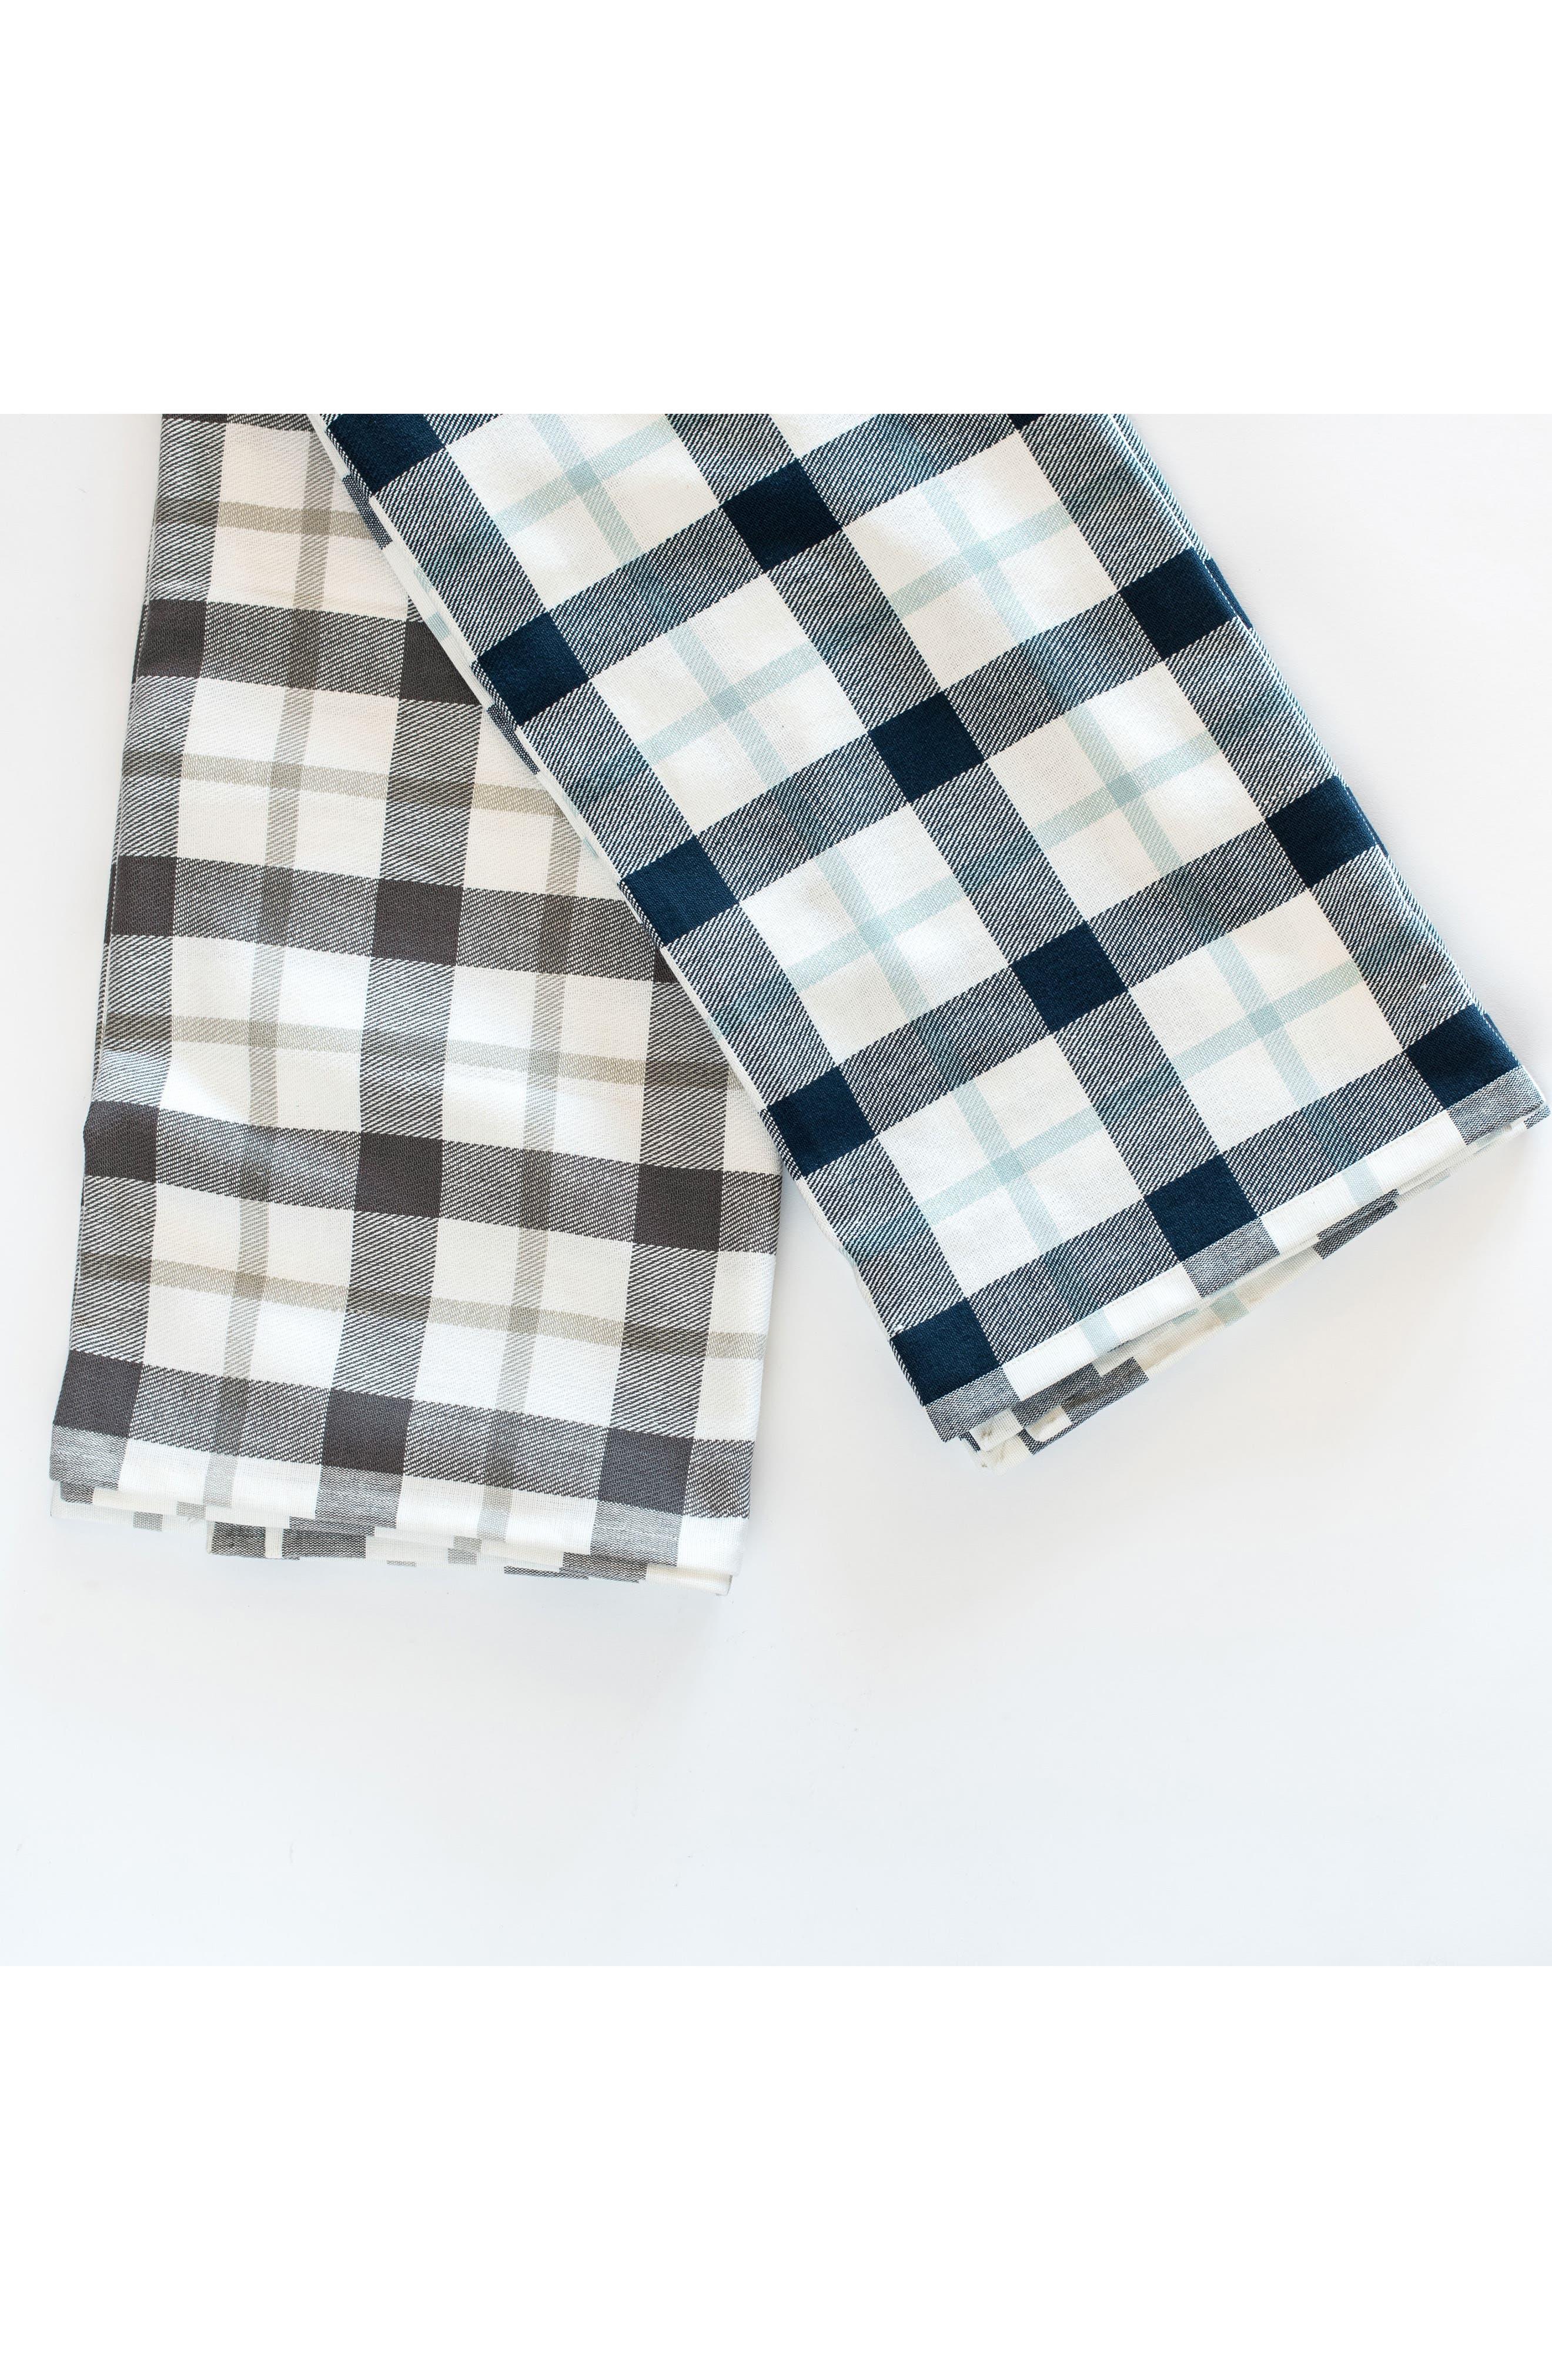 Kingsley Throw Blanket,                             Alternate thumbnail 2, color,                             020